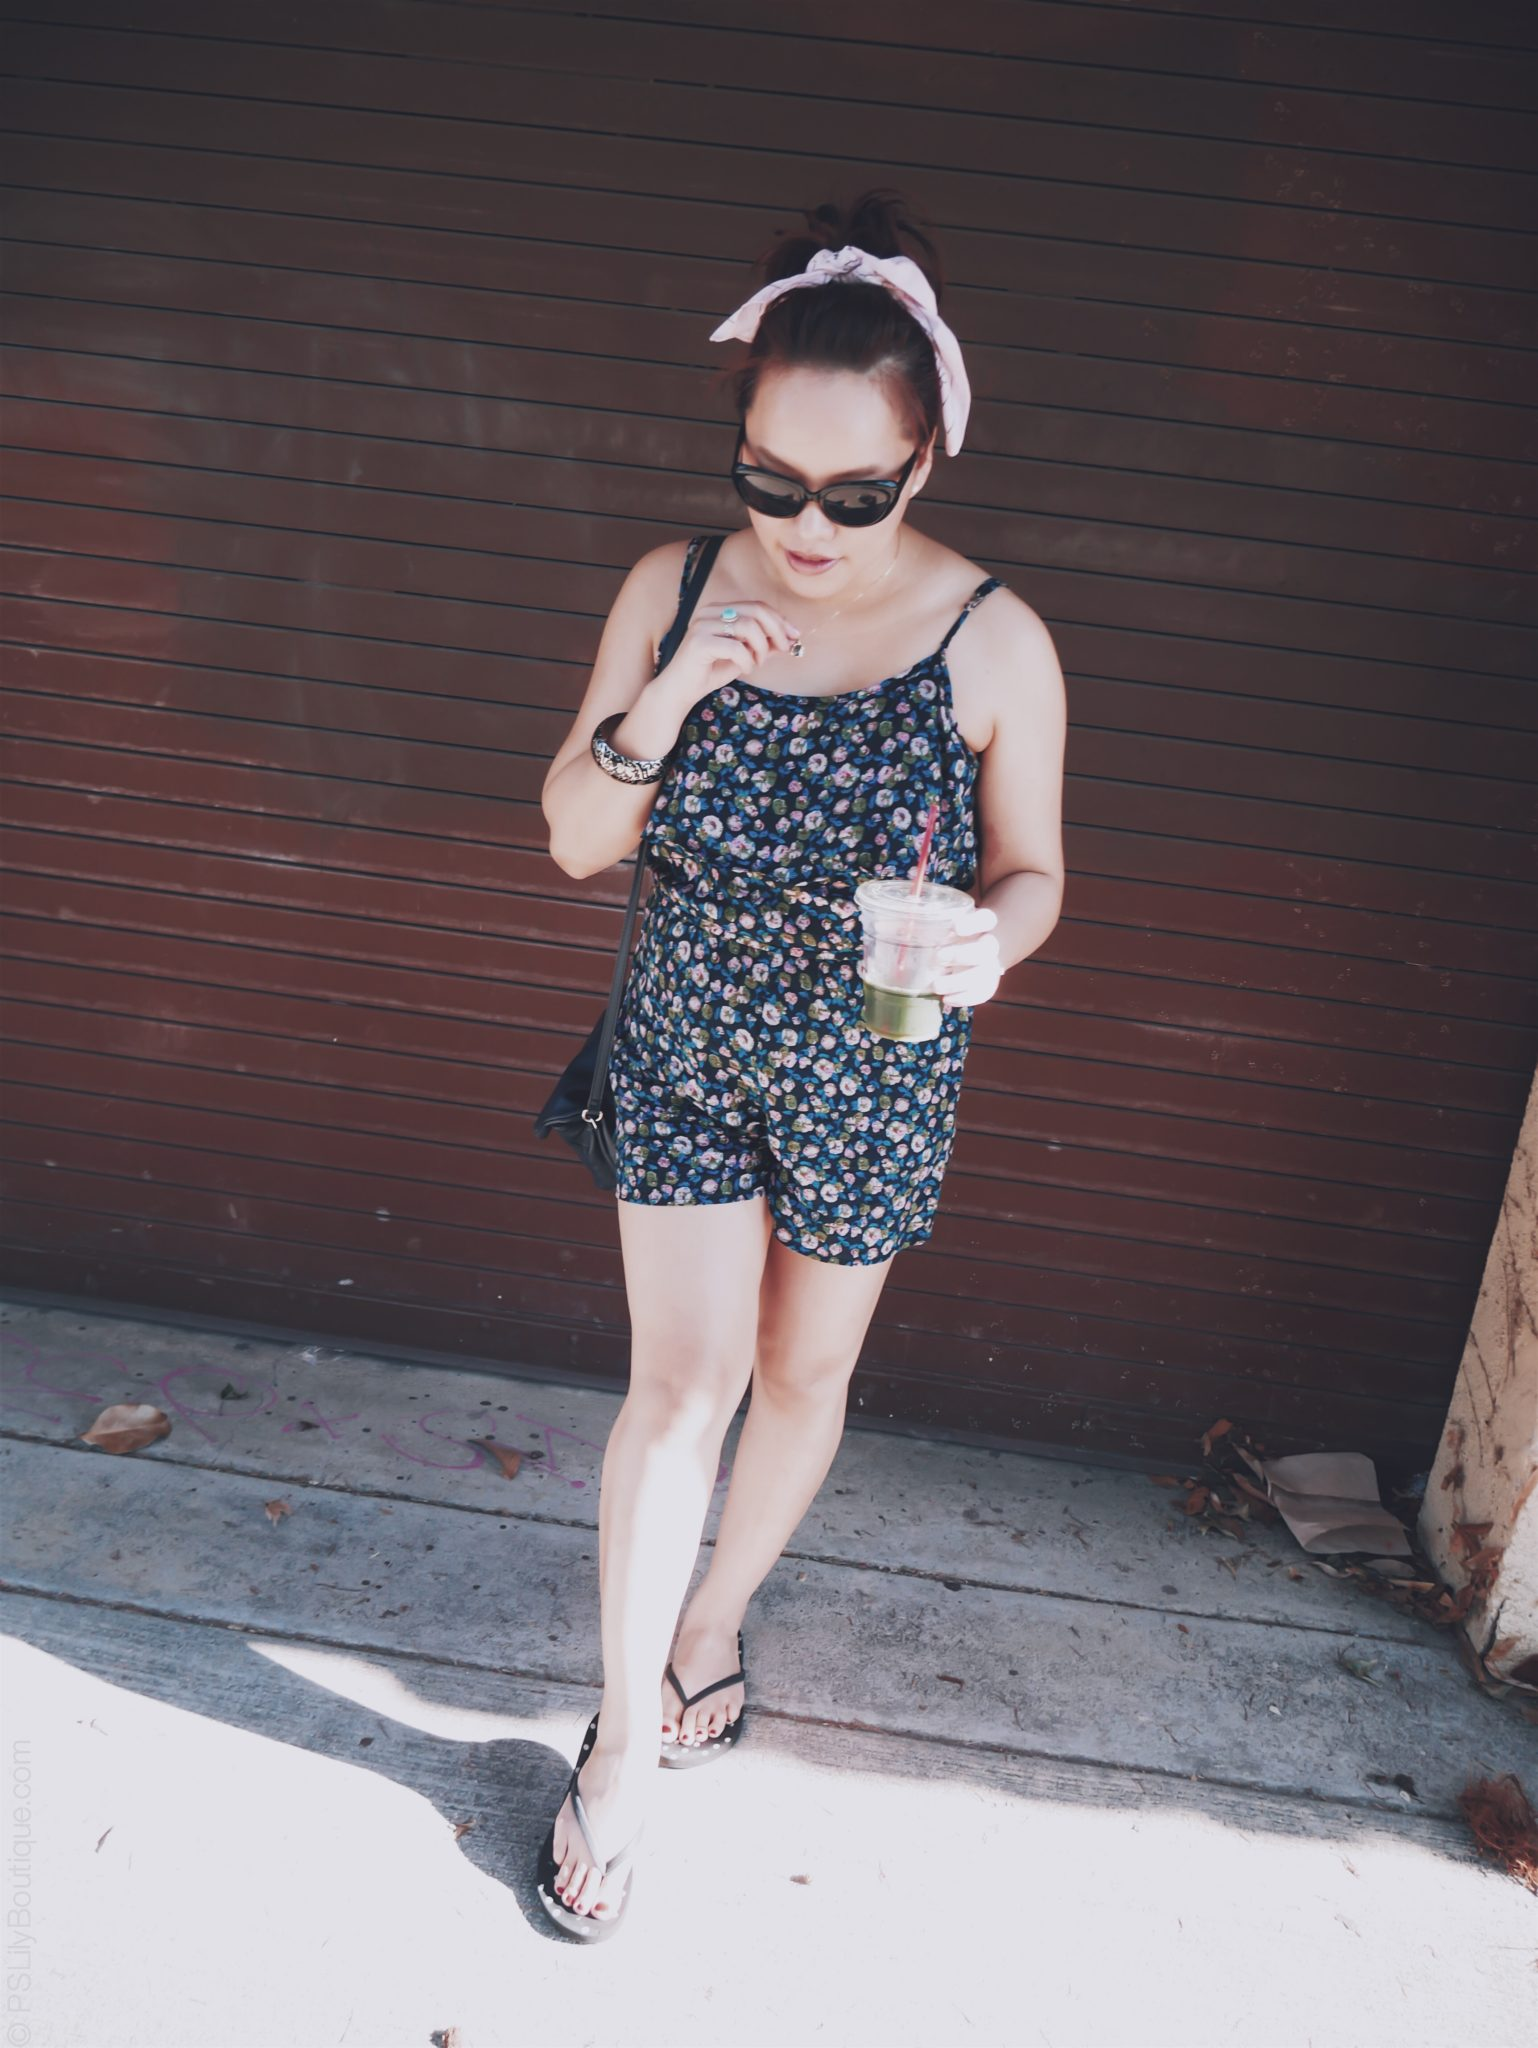 Leaf It Alone... Instagram: @ pslilyboutique, Pinterest, Twitter, Facebook, Los Angeles fashion blogger, top fashion blog, best fashion blog, fashion & personal style blog, travel blog, travel blogger, LA fashion blogger, Women's Black Flip Flops, Target, Kenneth Cole Reaction Navy Blue Gretchen Crossbody Bag, Anthropologie Pink Bandana Scarf, Long Hair Style, Top Knot Bun, Ootd, Spring & Summer 2018 Outfit Ideas, Navy Blue Floral Romper, My Style, Spring & Summer 2018 Outfit Ideas, Travel Outfit,